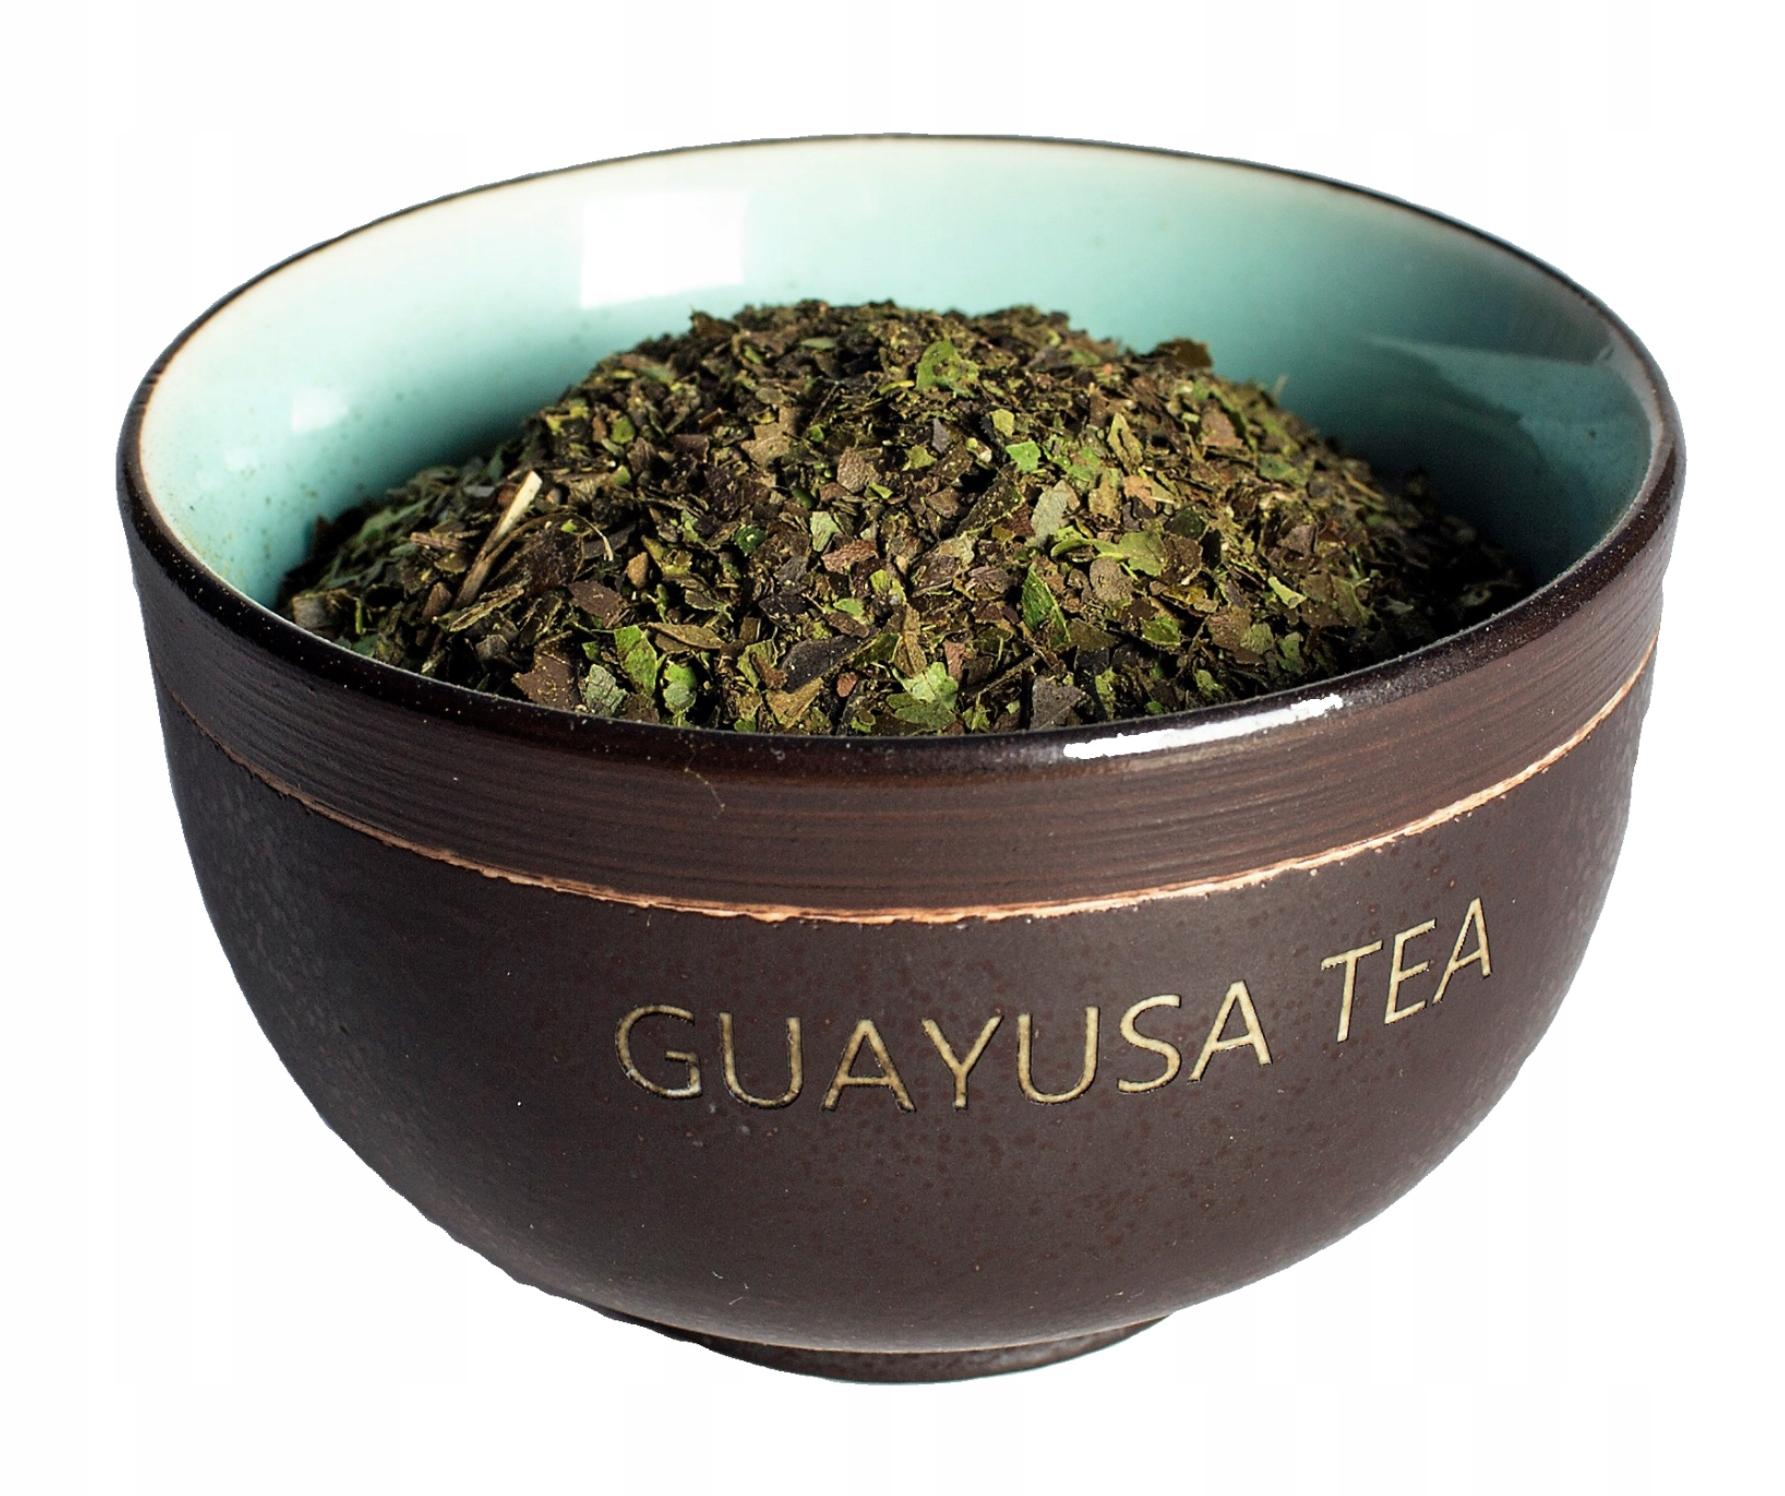 Ilex Guayusa 250g, Energia, Relax, Skupienie, Moc EAN 5903684211050